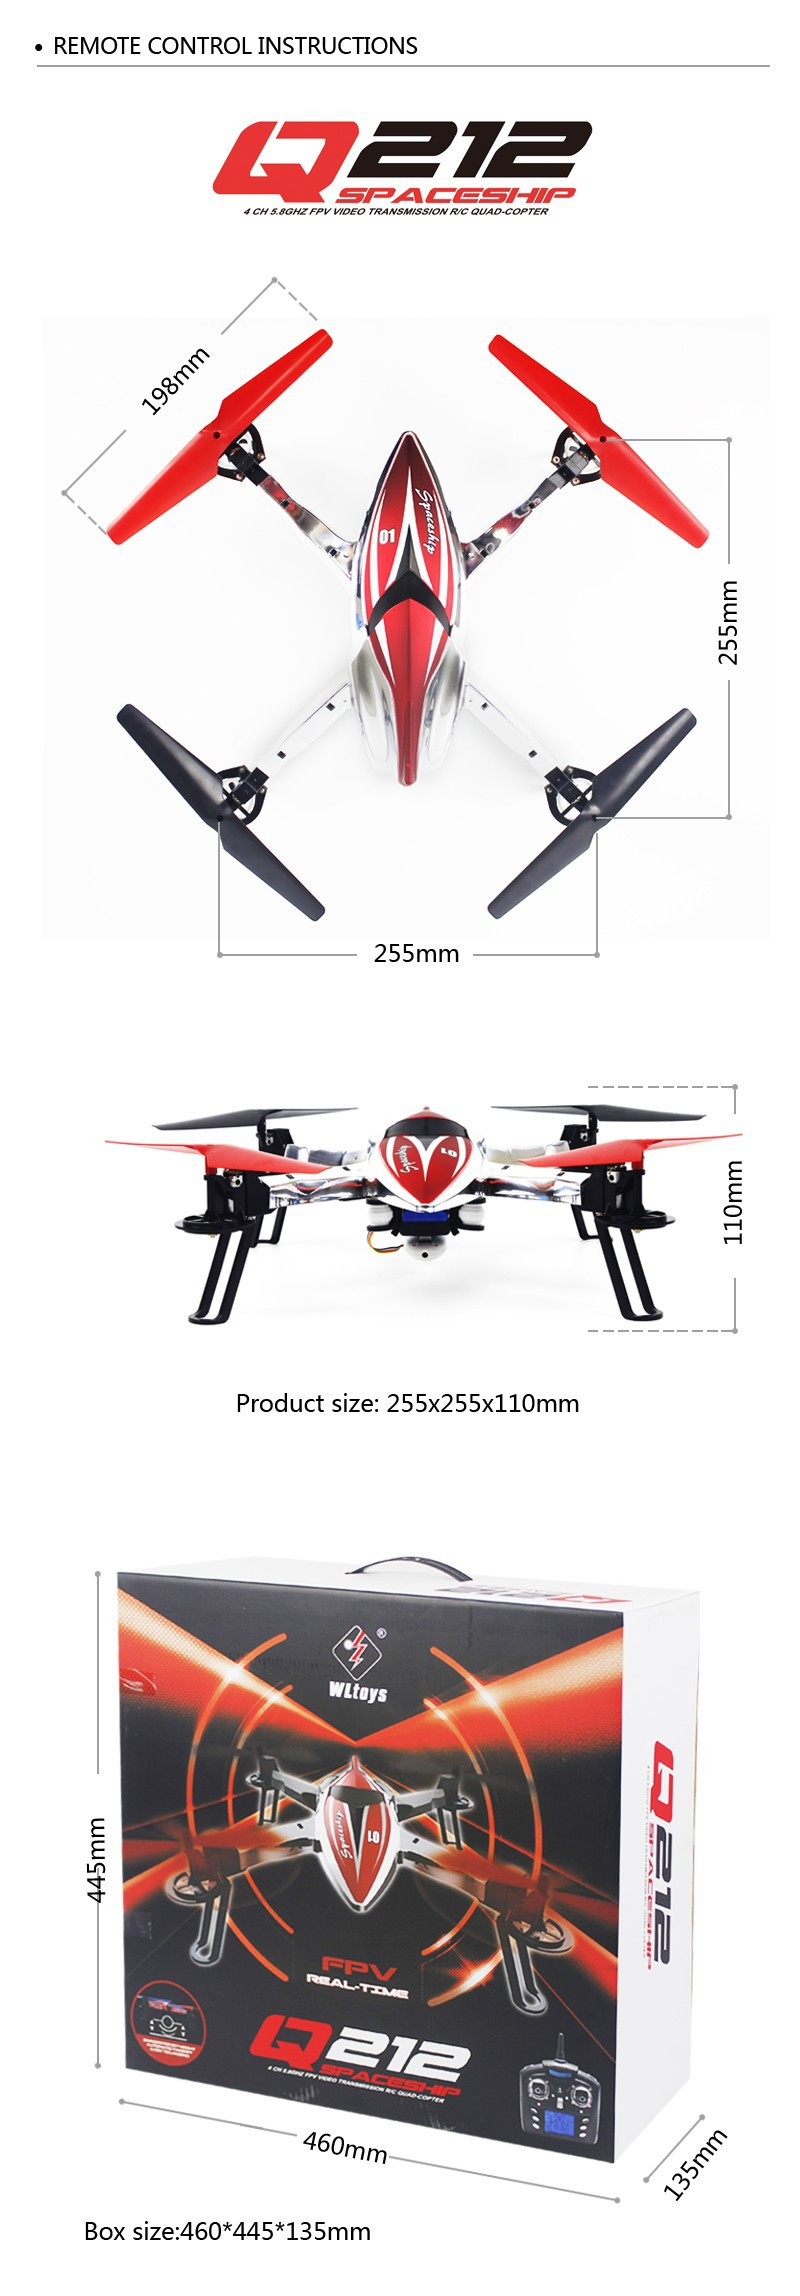 WLtoys Q212K WiFi FPV One-Key-return & Take Off Barometer Set High RC Quadcopter with HD Camera RTF VS Q212-K/Q242-K/Q282-K